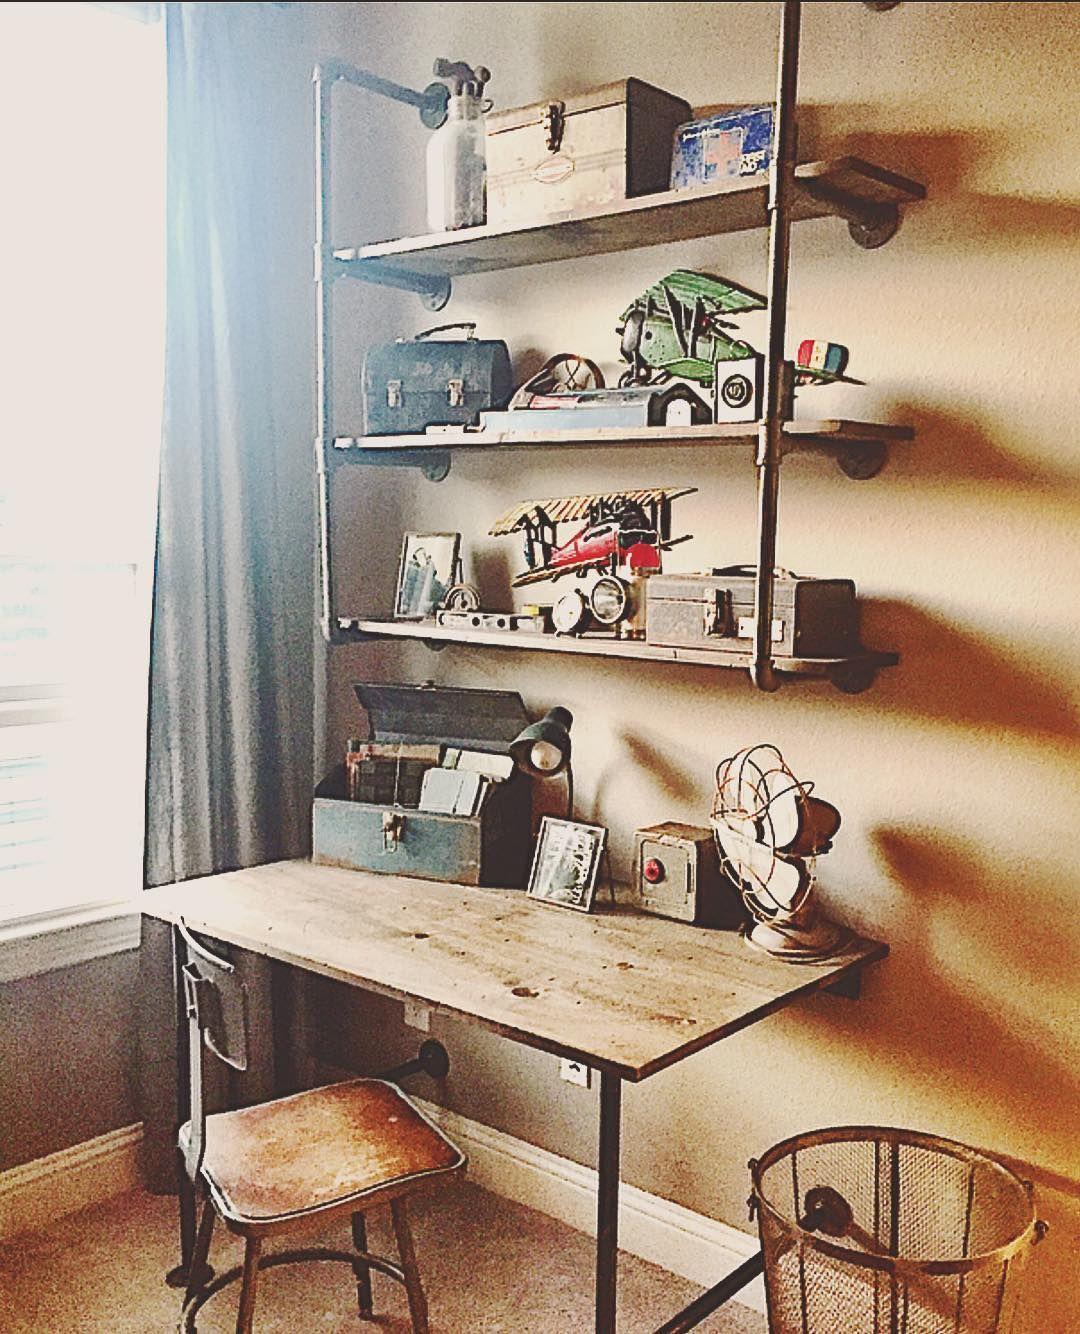 Full Picture Of The Desk And Shelves #carpenterhusband #besthusbandever  #bigboyroom #vintageairplane #vintagefarmhouse